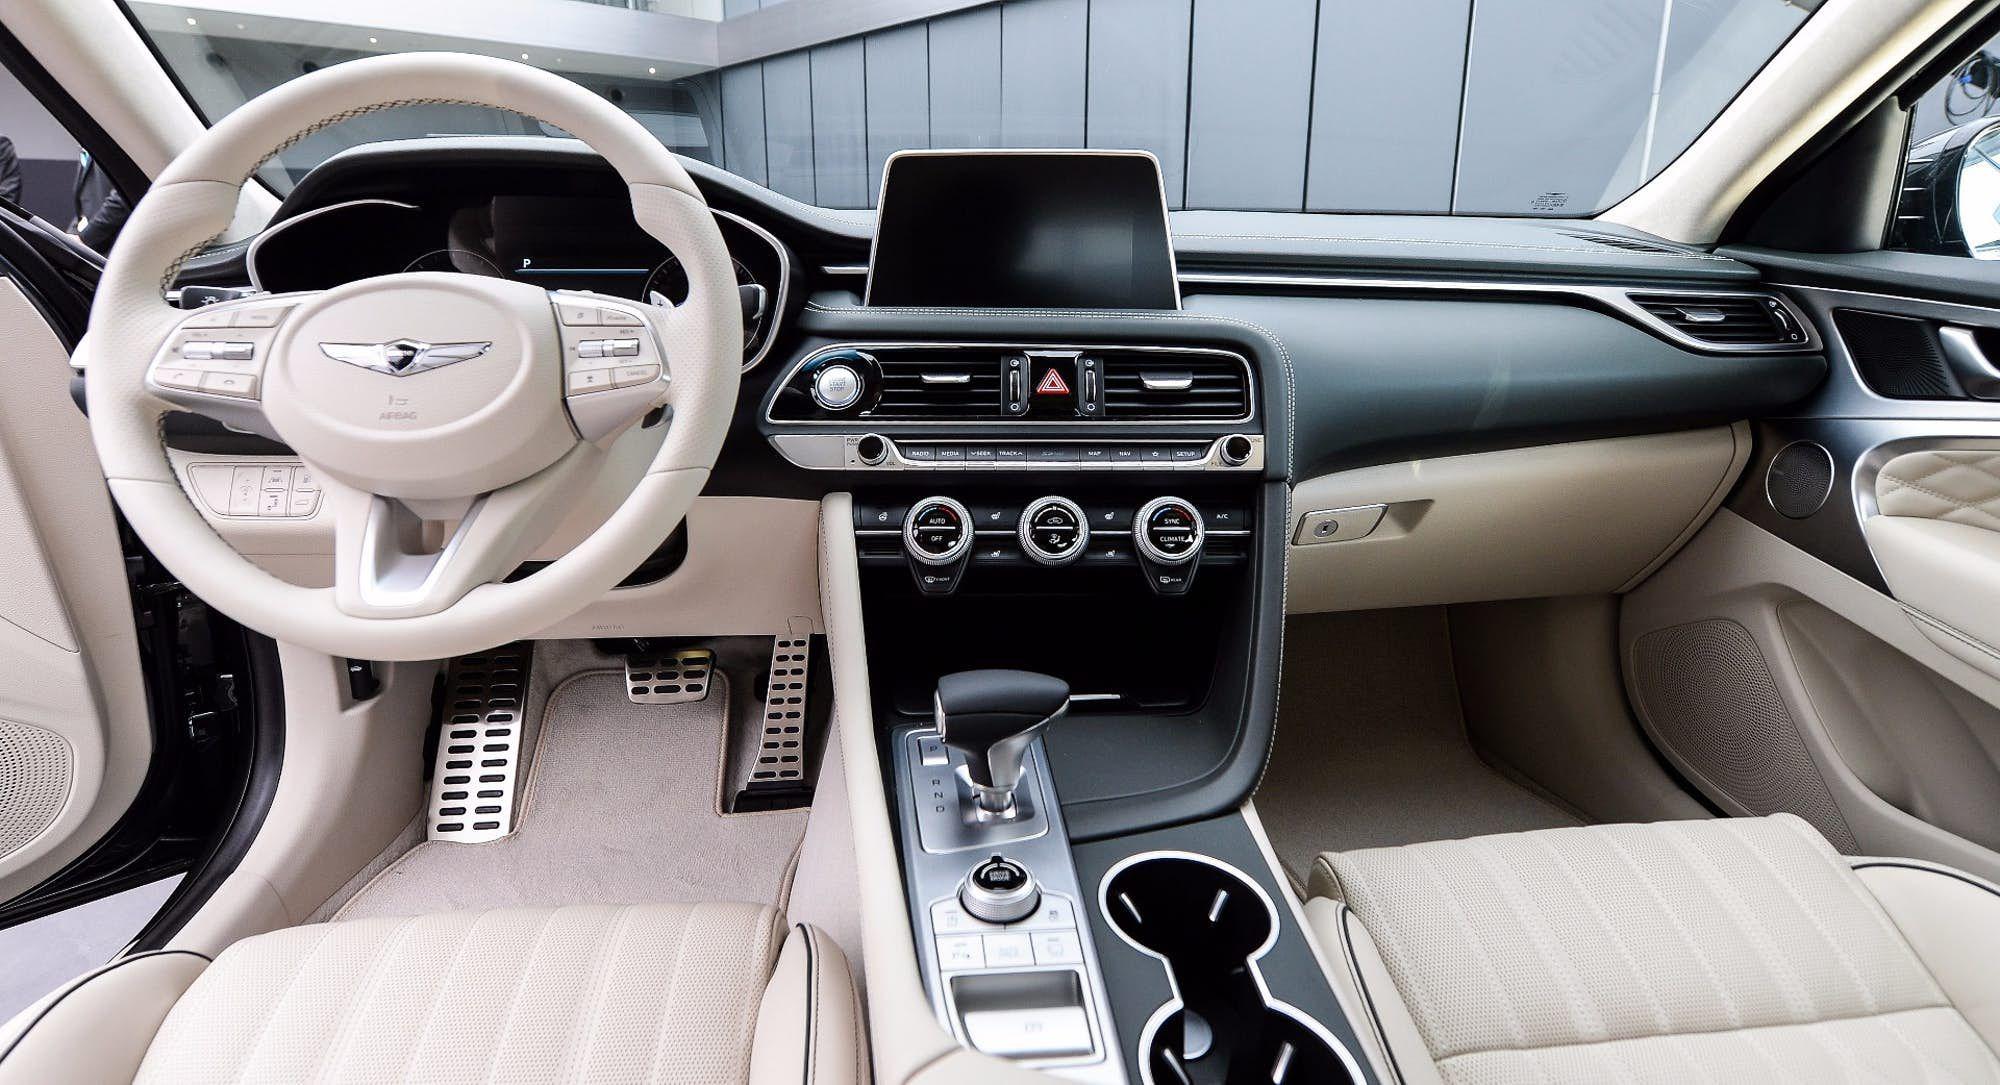 Another Interior Trim Option In The Genesis G70 Sports Sedan Hyundai Hyundai Genesis